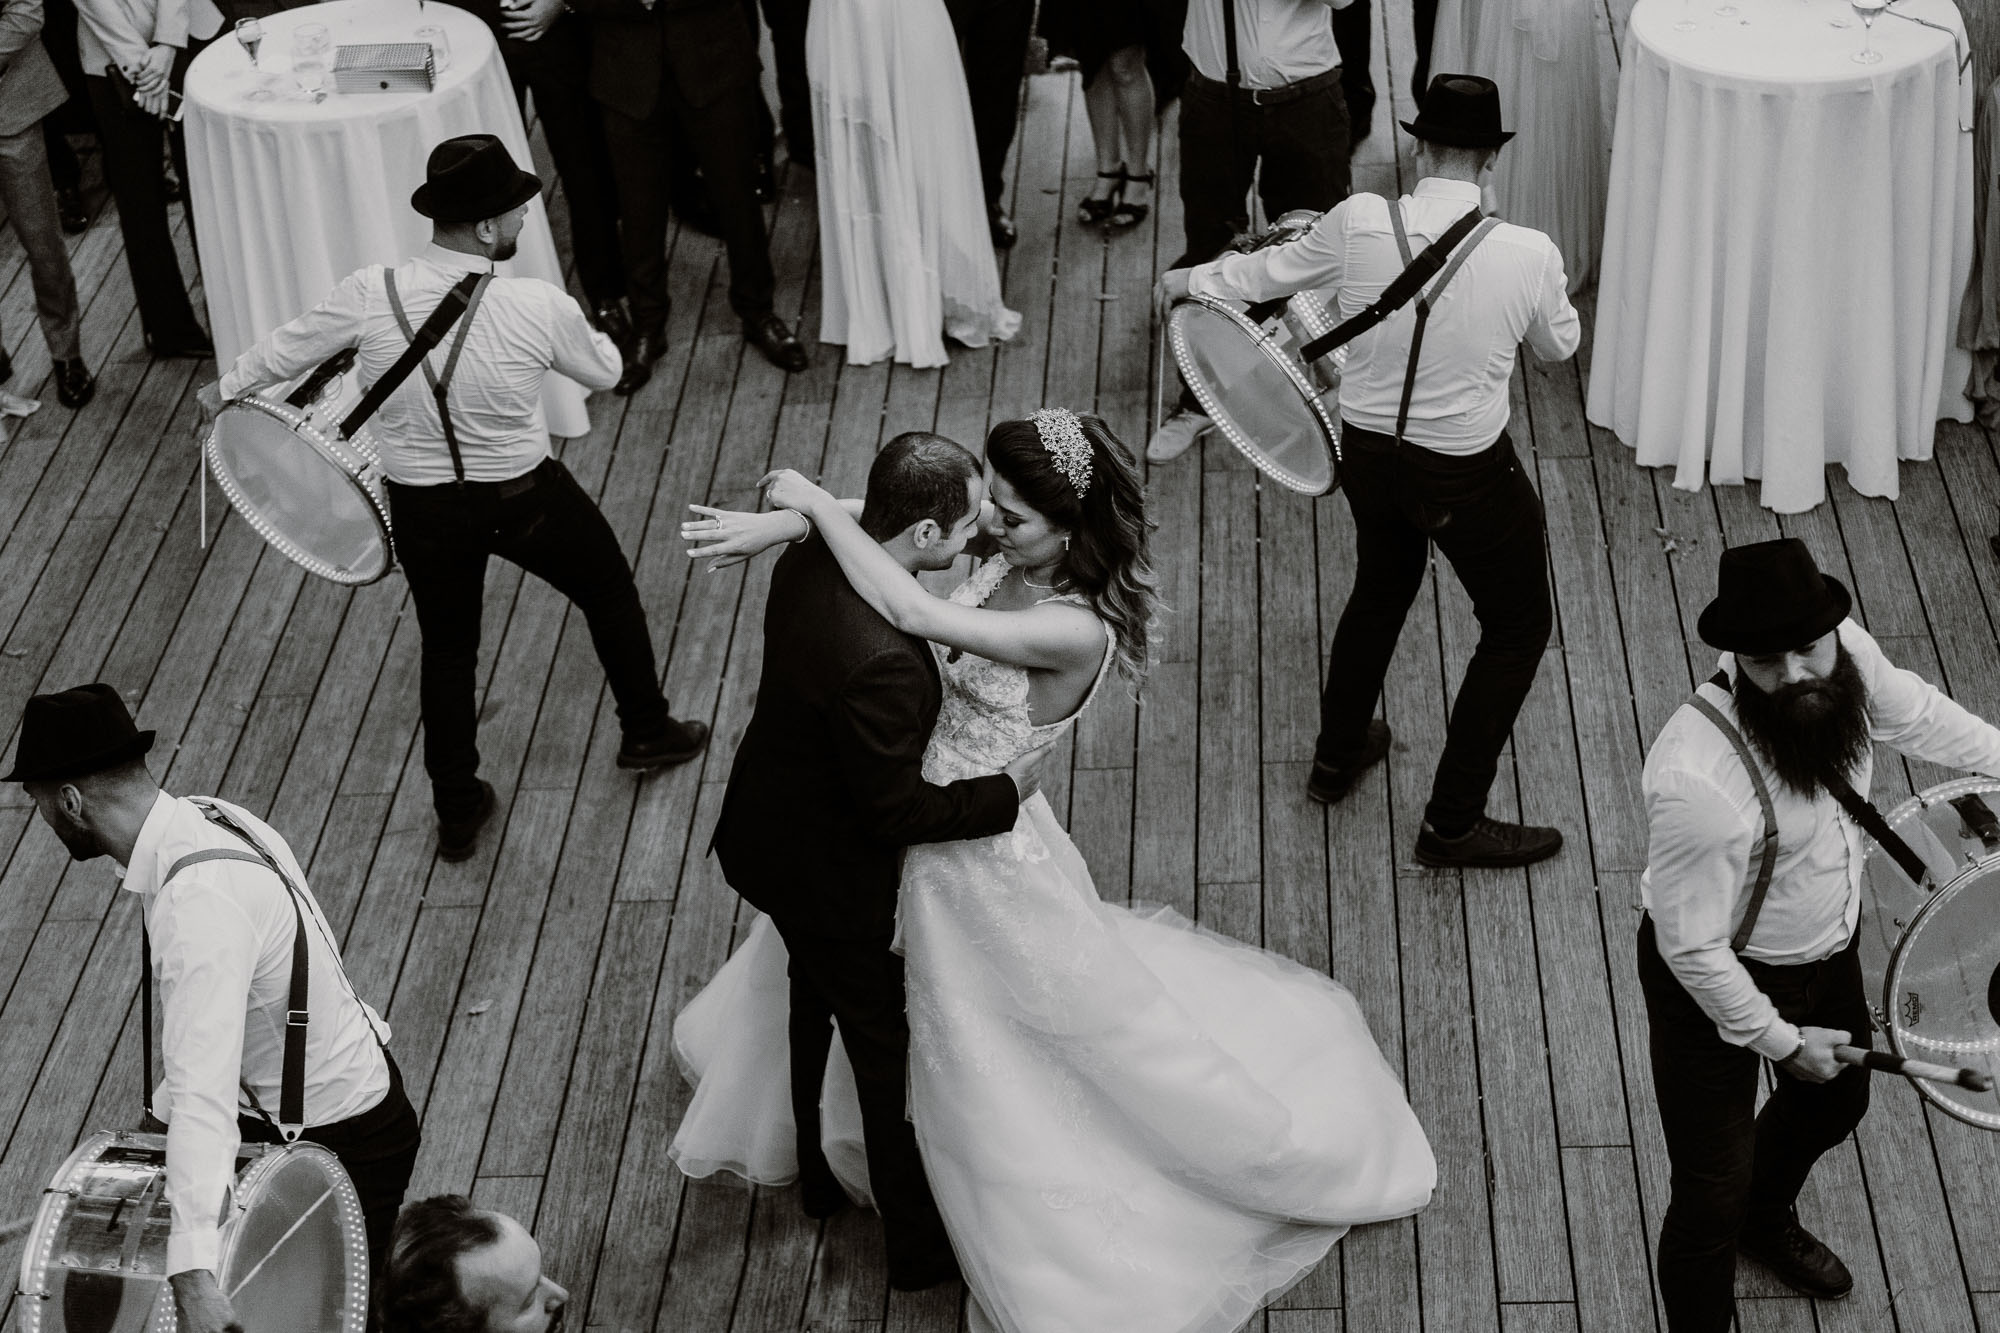 20180818 Dagmara Bojenko Mariage Eduardo Maya 1351 - Dagmara Bojenko - Eco-conscious Weddings, Births & Families